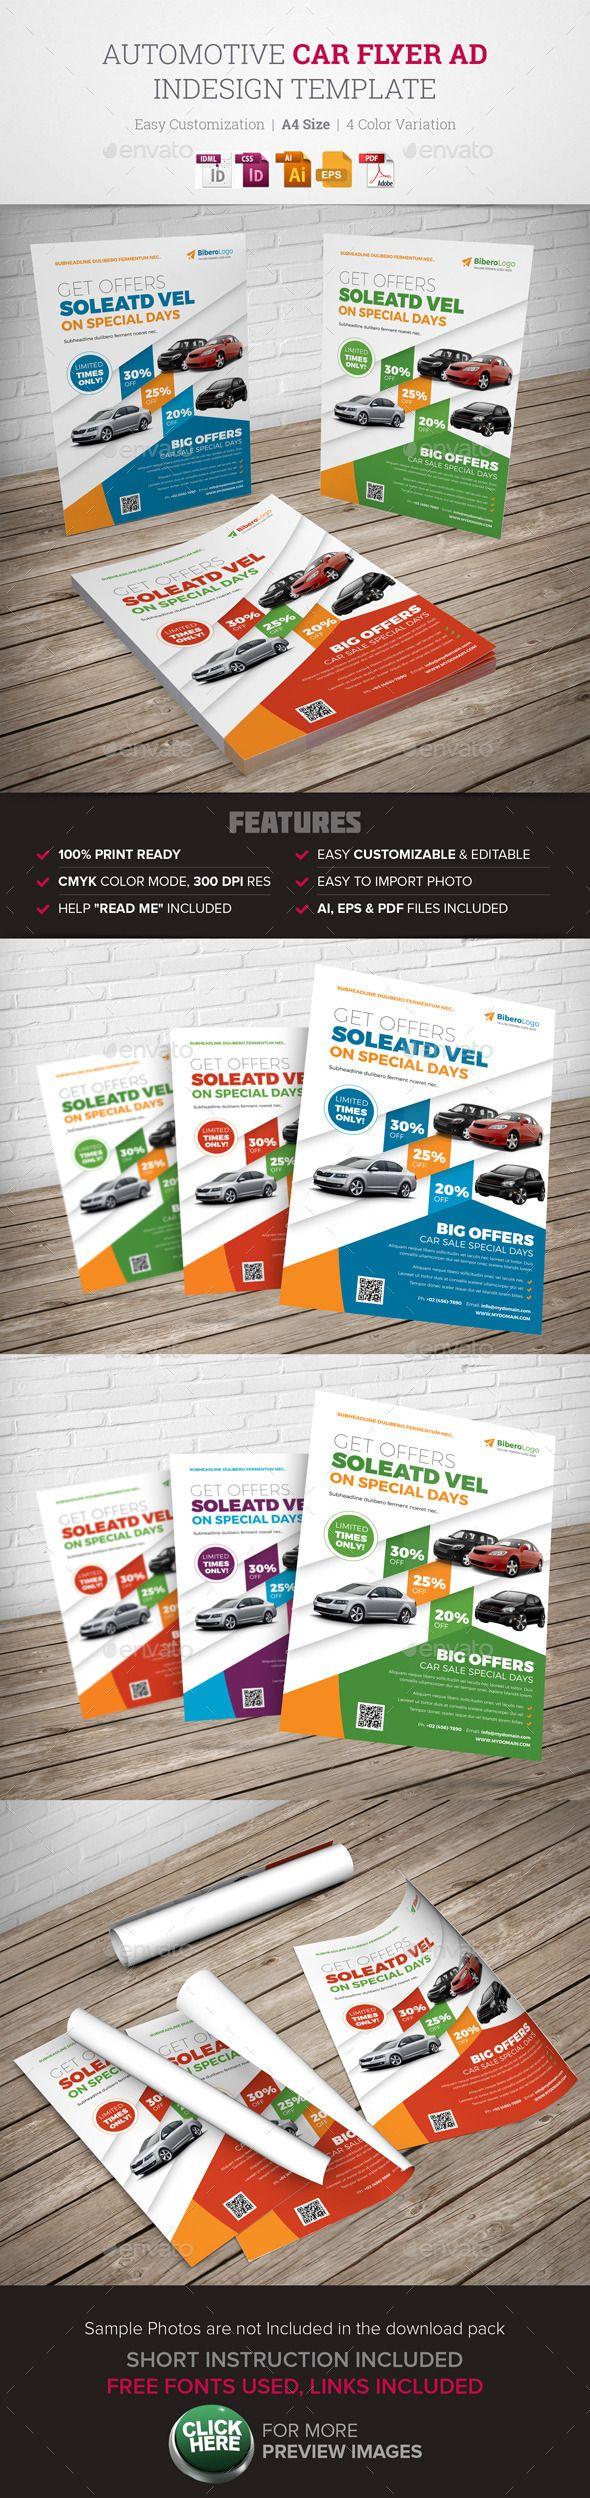 Automotive Car Flyer Ad Indesign Template | Pinterest | Volantes